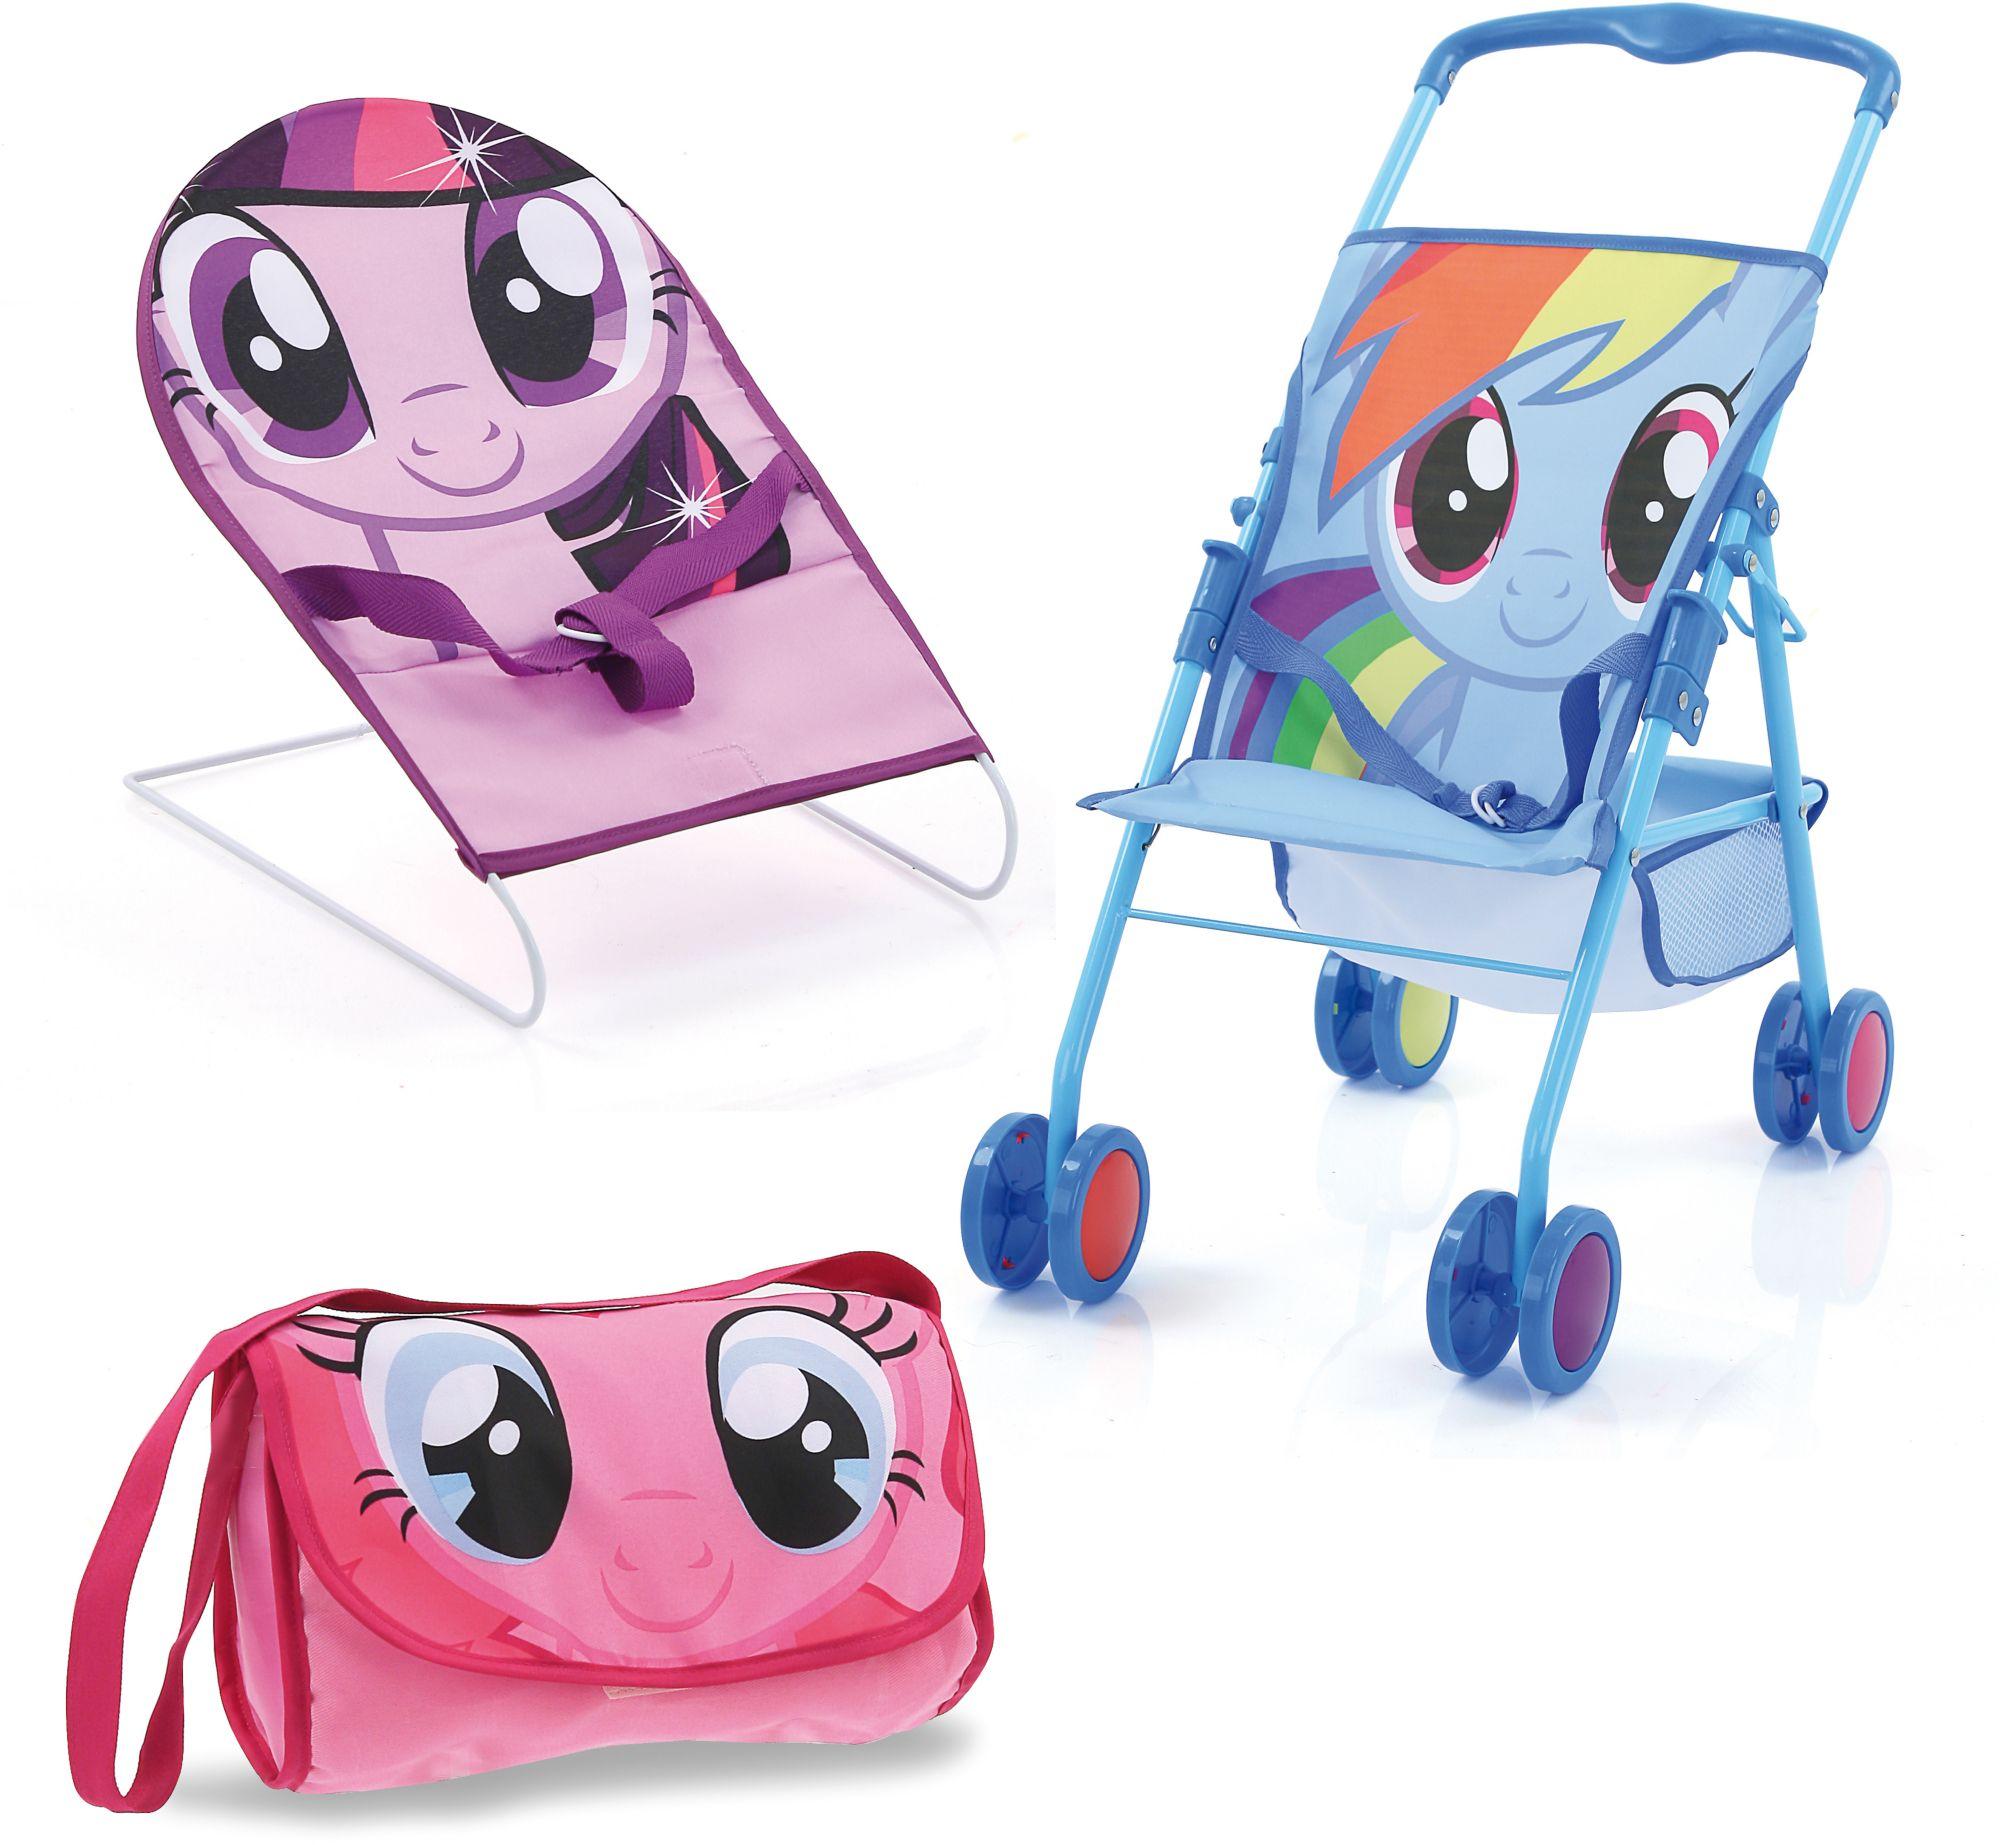 HAUCK TOYS FOR KIDS hauck TOYS FOR KIDS Puppenzubehör-Set 3tlg., »Friendship Set, My Little Pony«